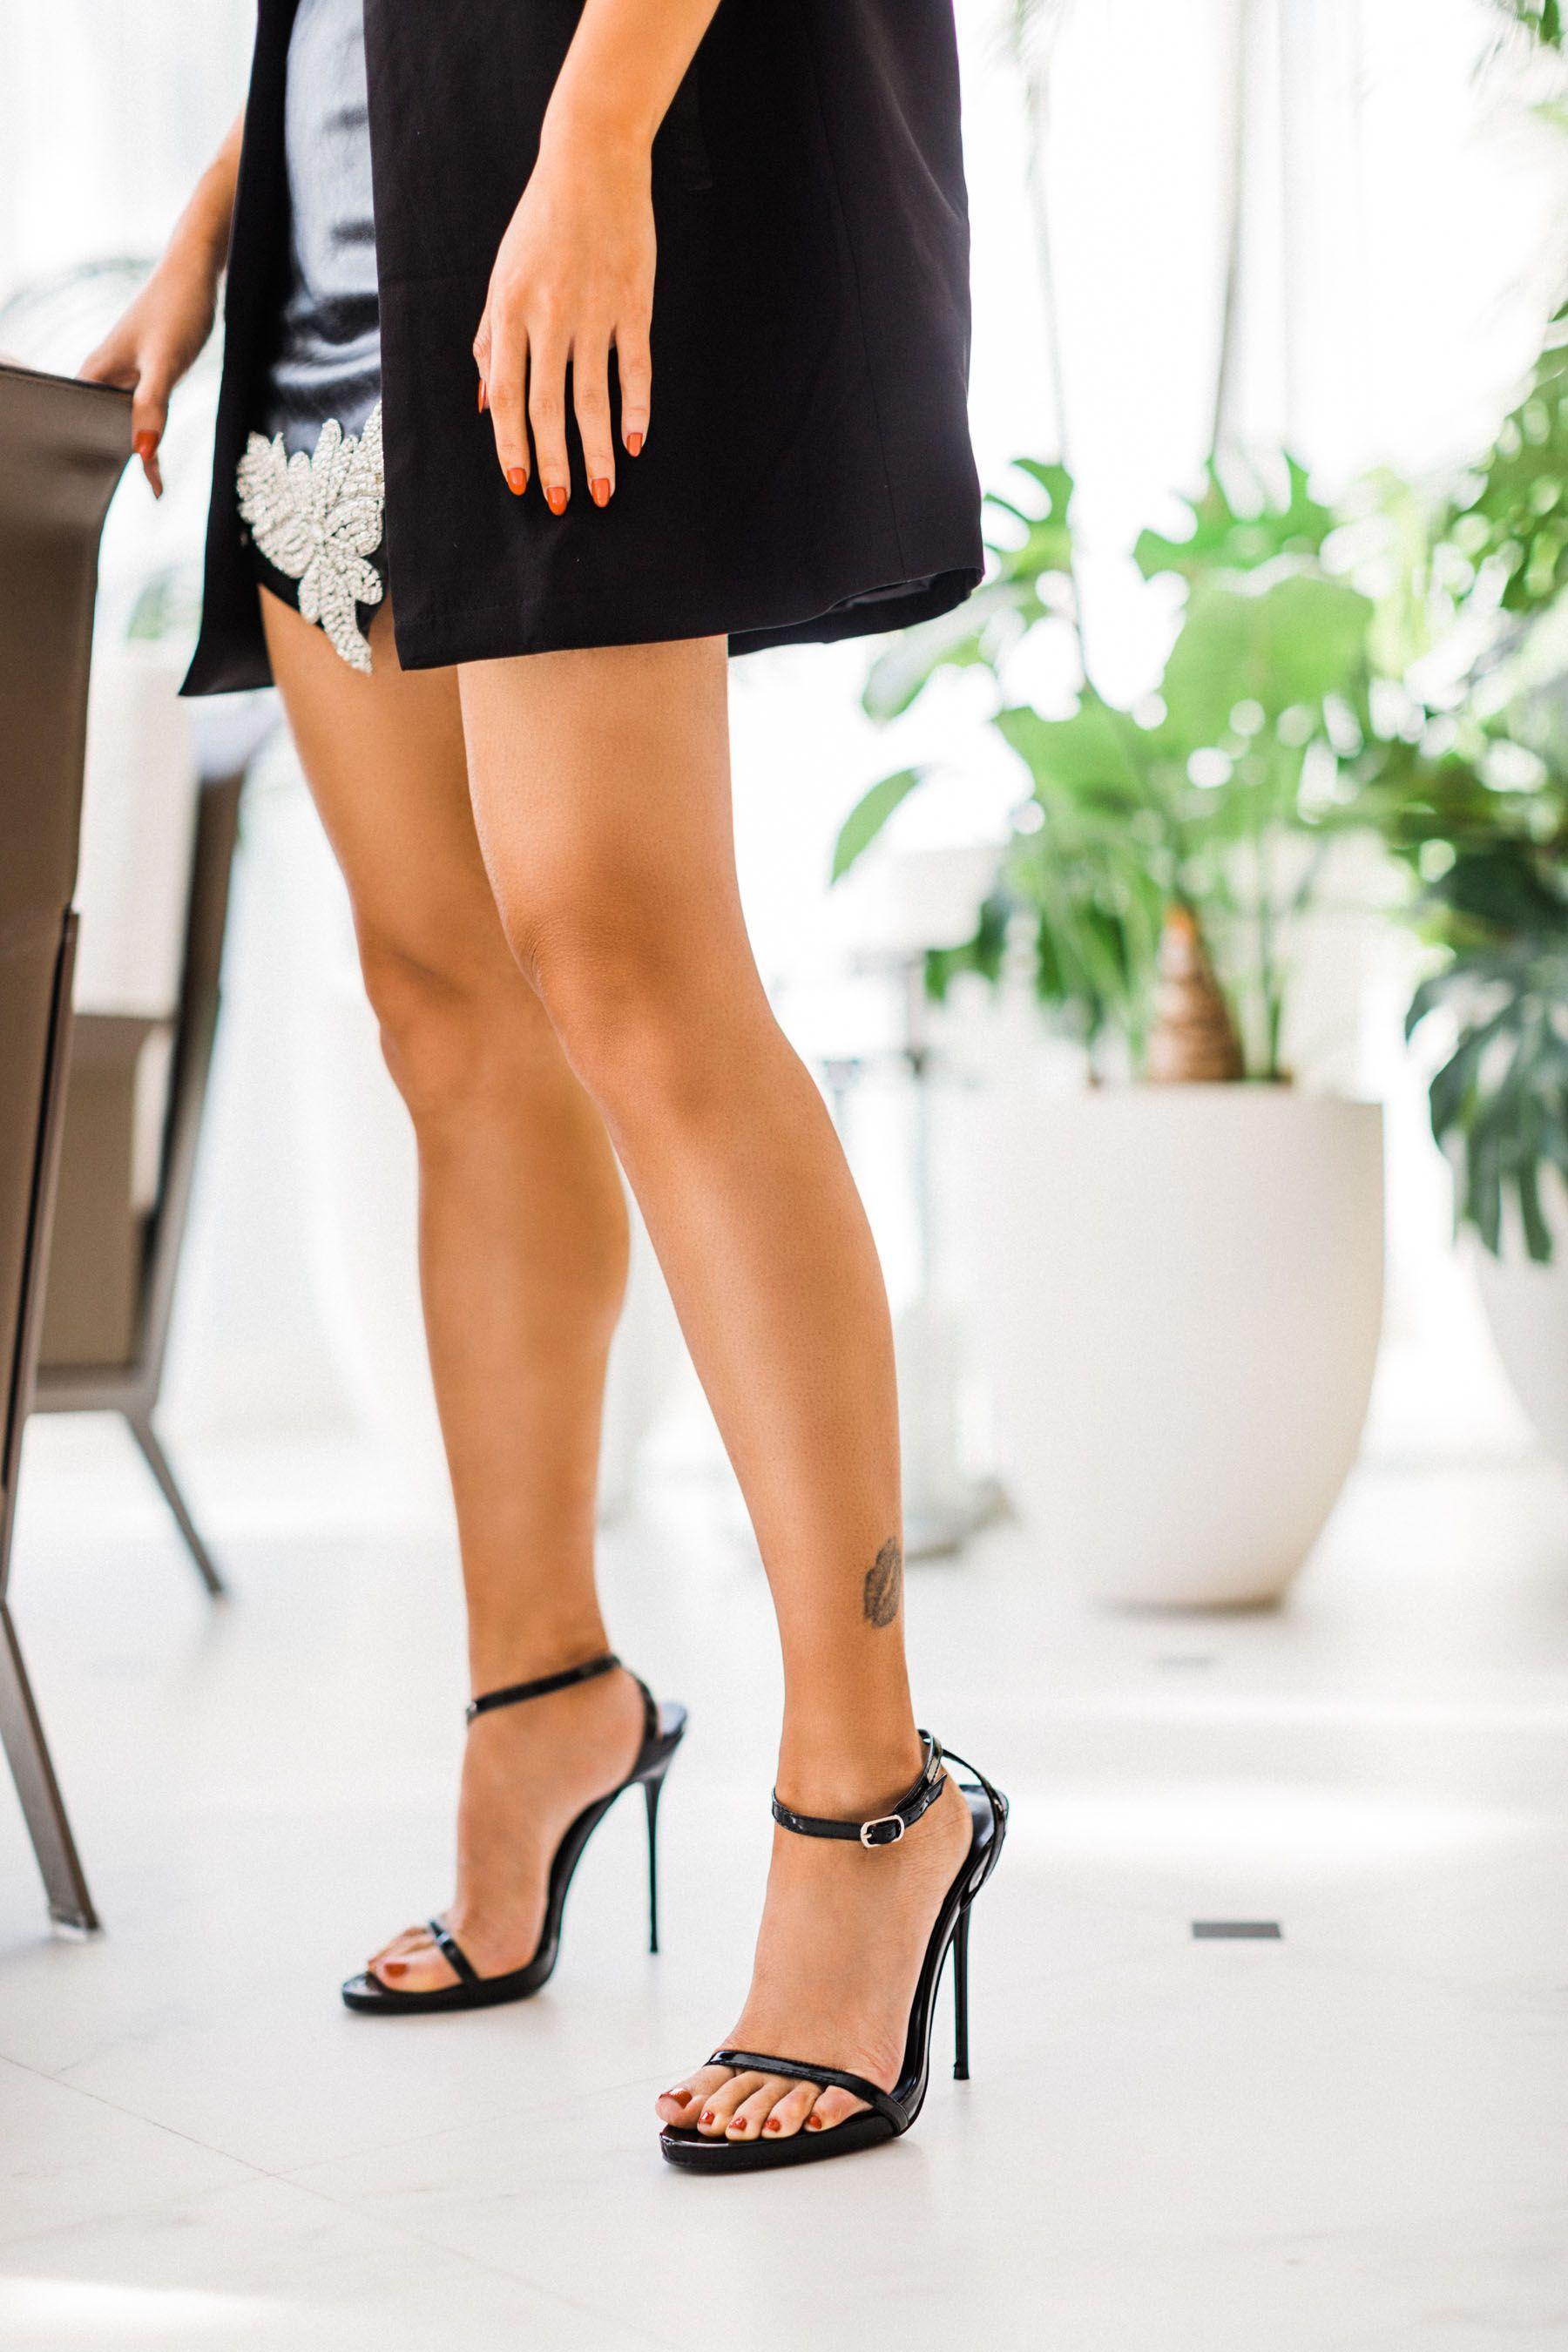 Black Simple Ankle Strap Heels Notjessfashion Com Black Dressy Heels Black Sandals Night Hot Party Dresses Women Backpack Fashion Fashion Designer List